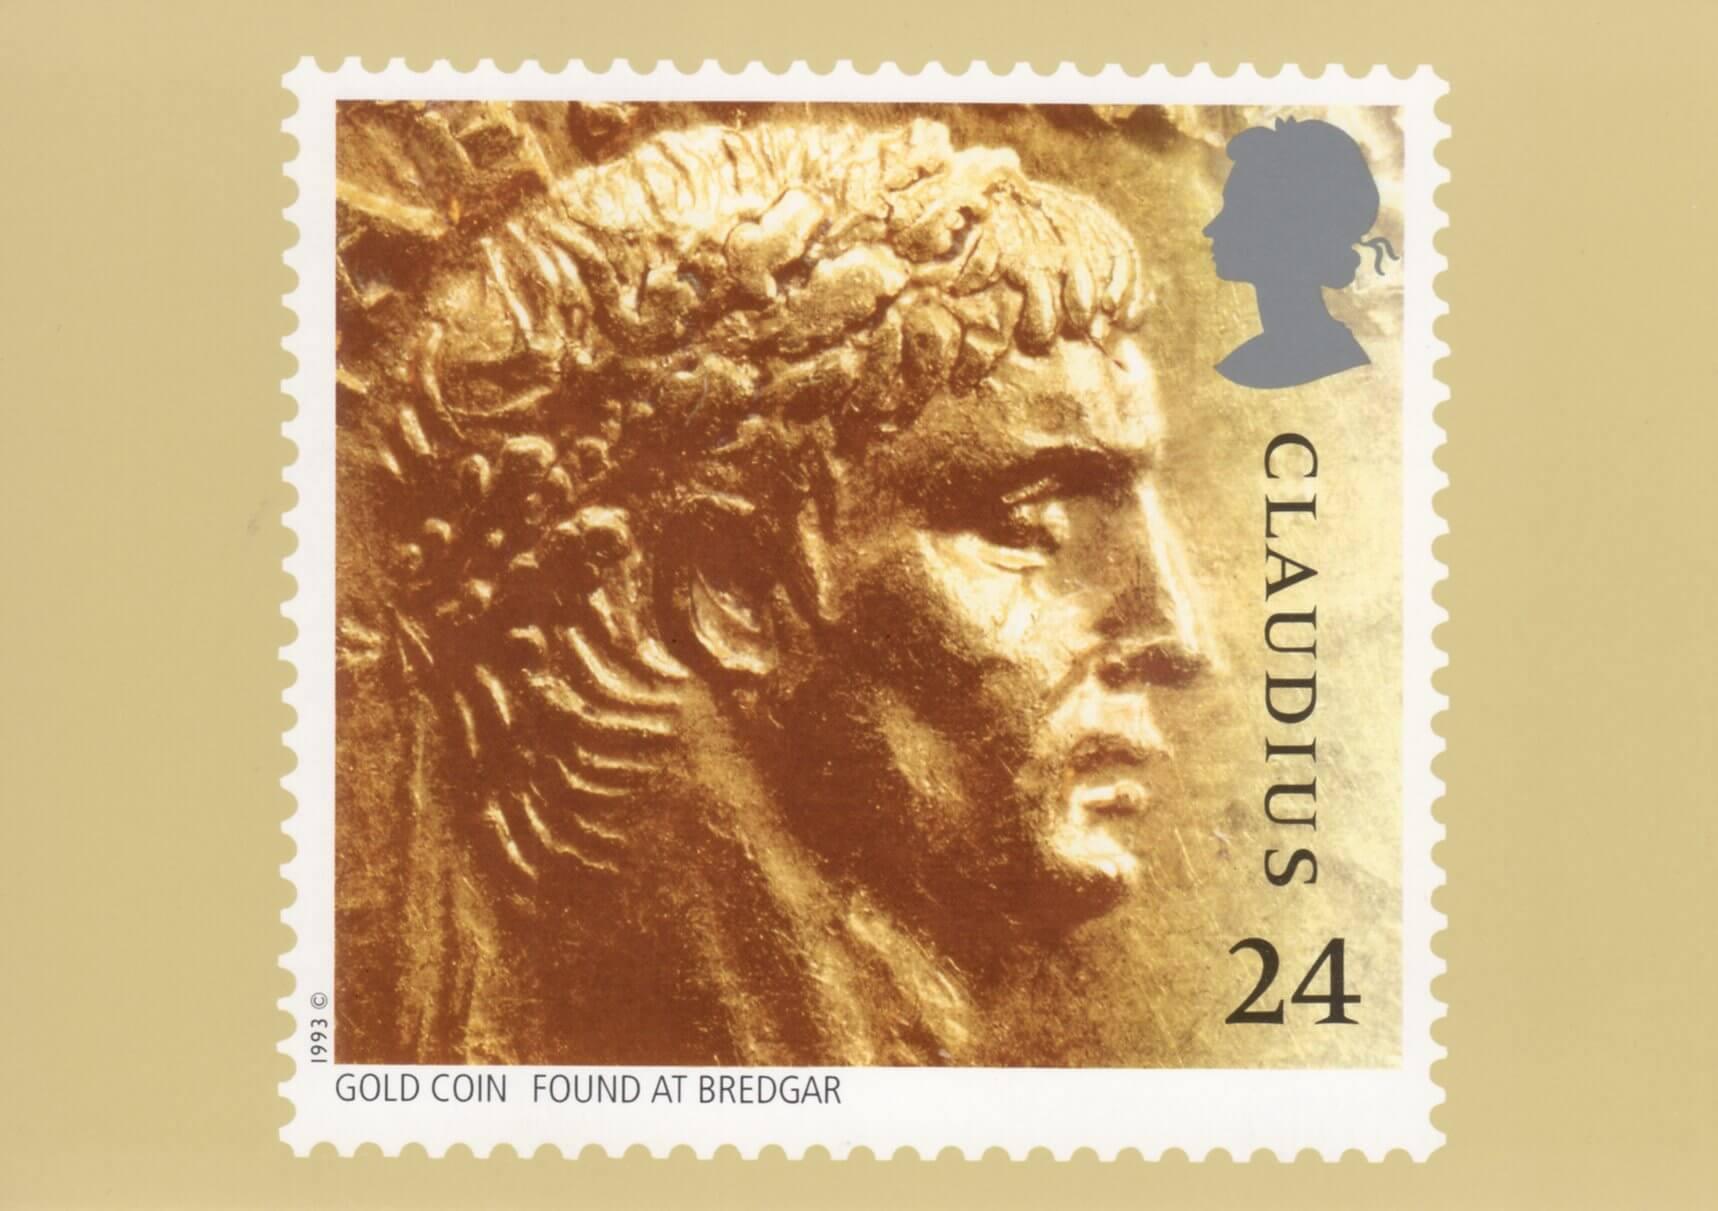 Roman Britain 1993 Collect Gb Stamps